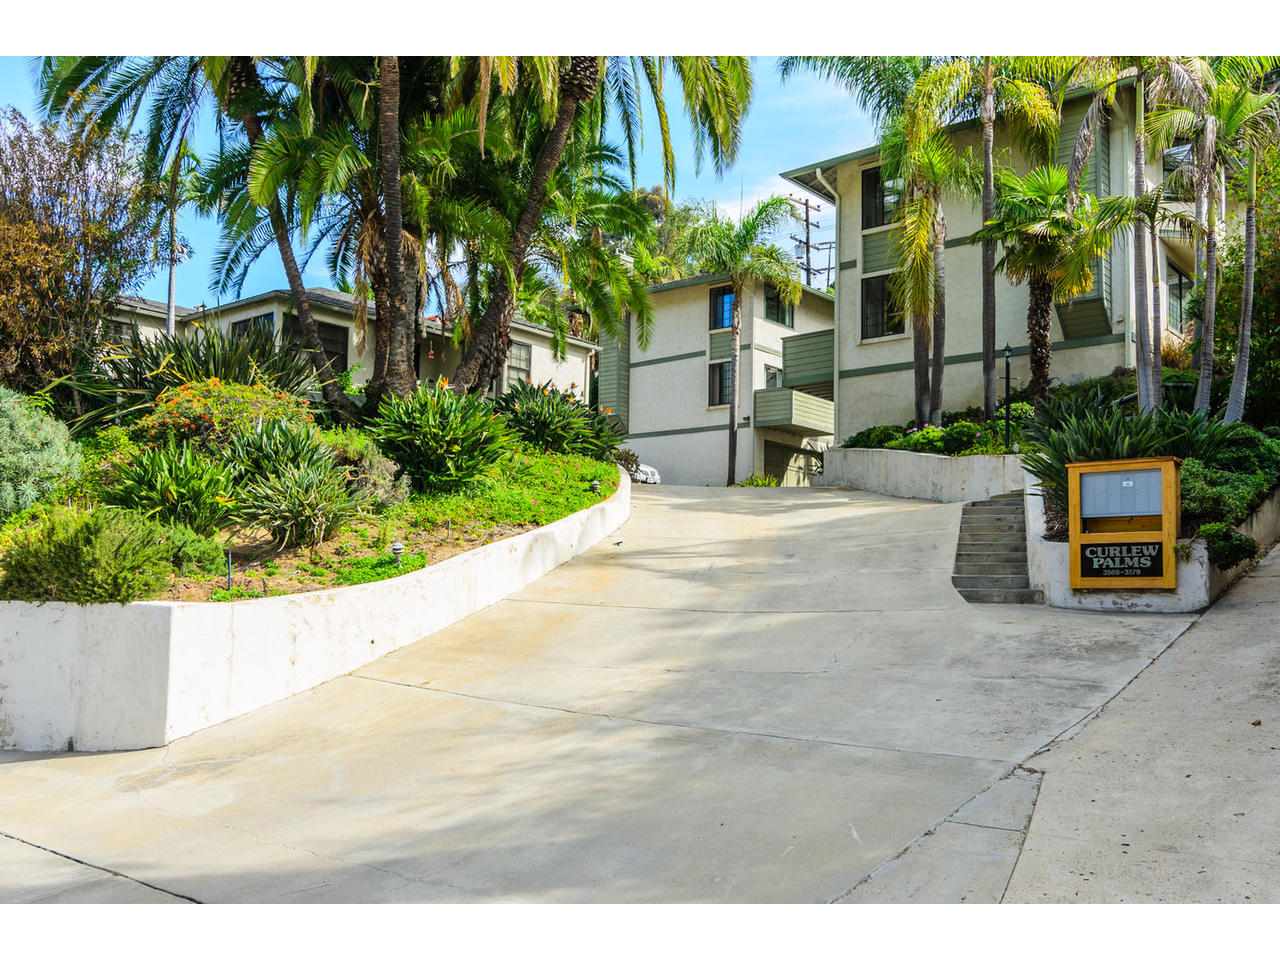 3579 Curlew Street San Diego-MLS_Size-001-3579 Curlew Street San Diego-1280x960-72dpi.jpg